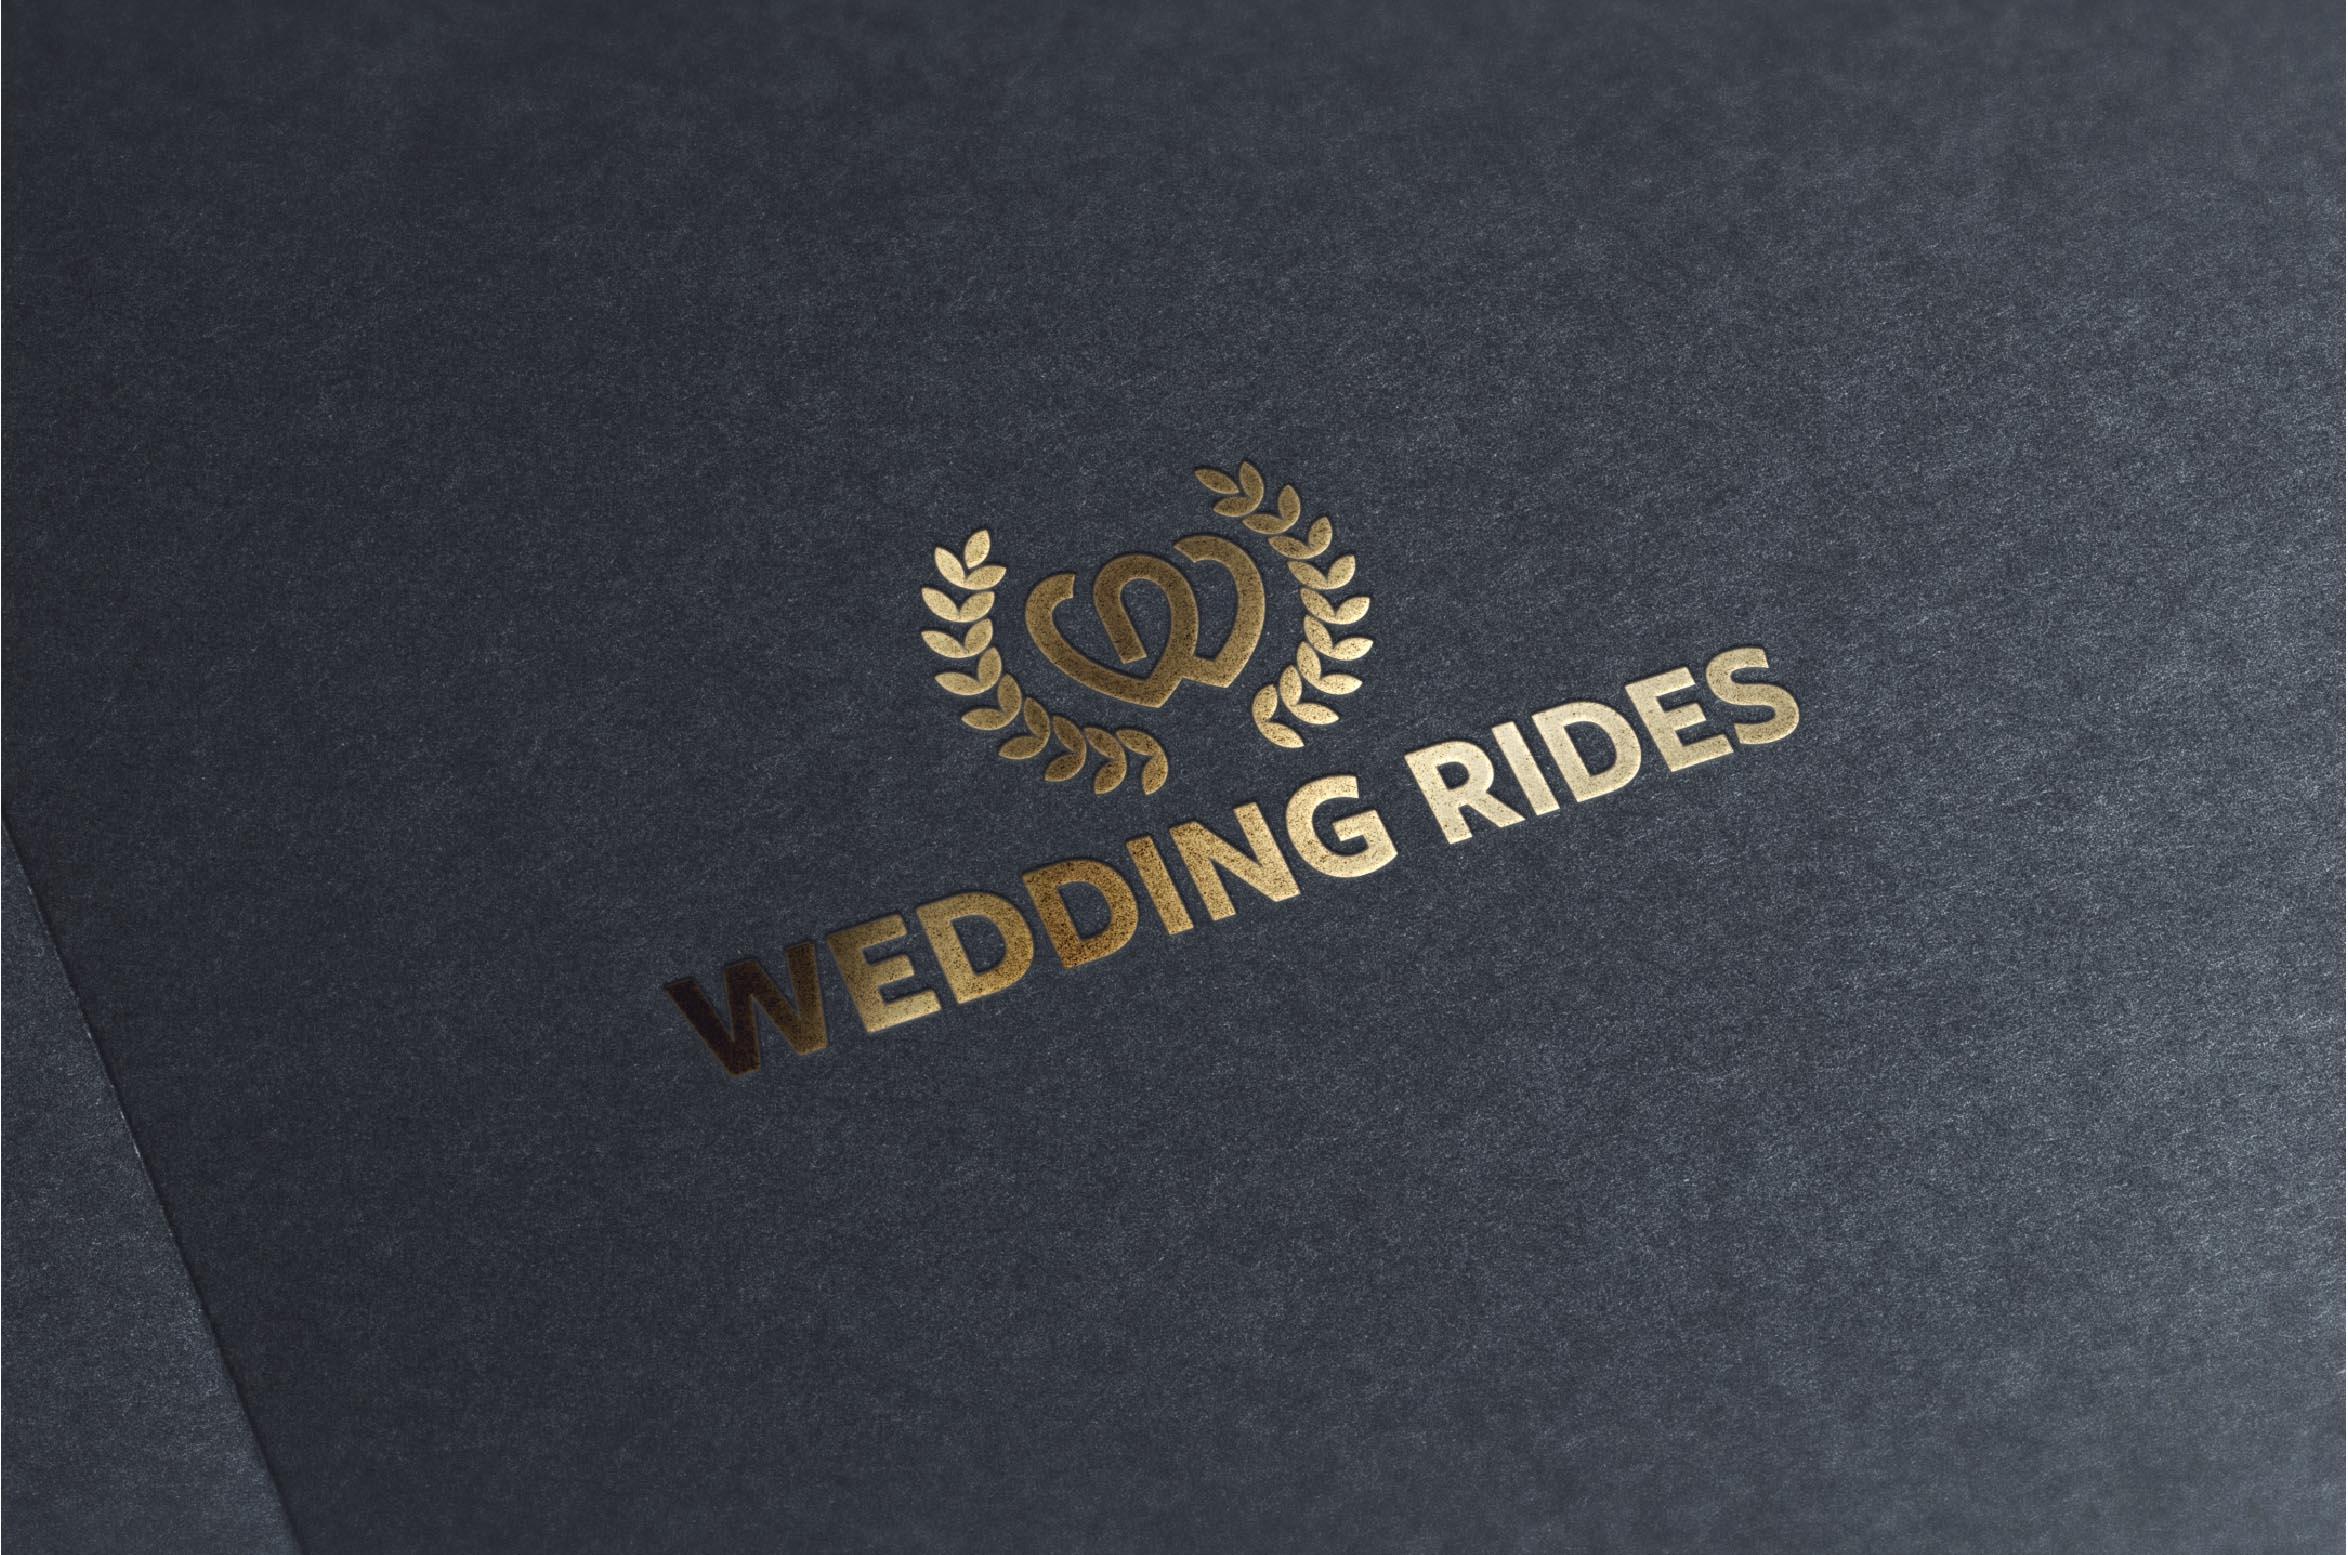 wedding rides logo onmockup